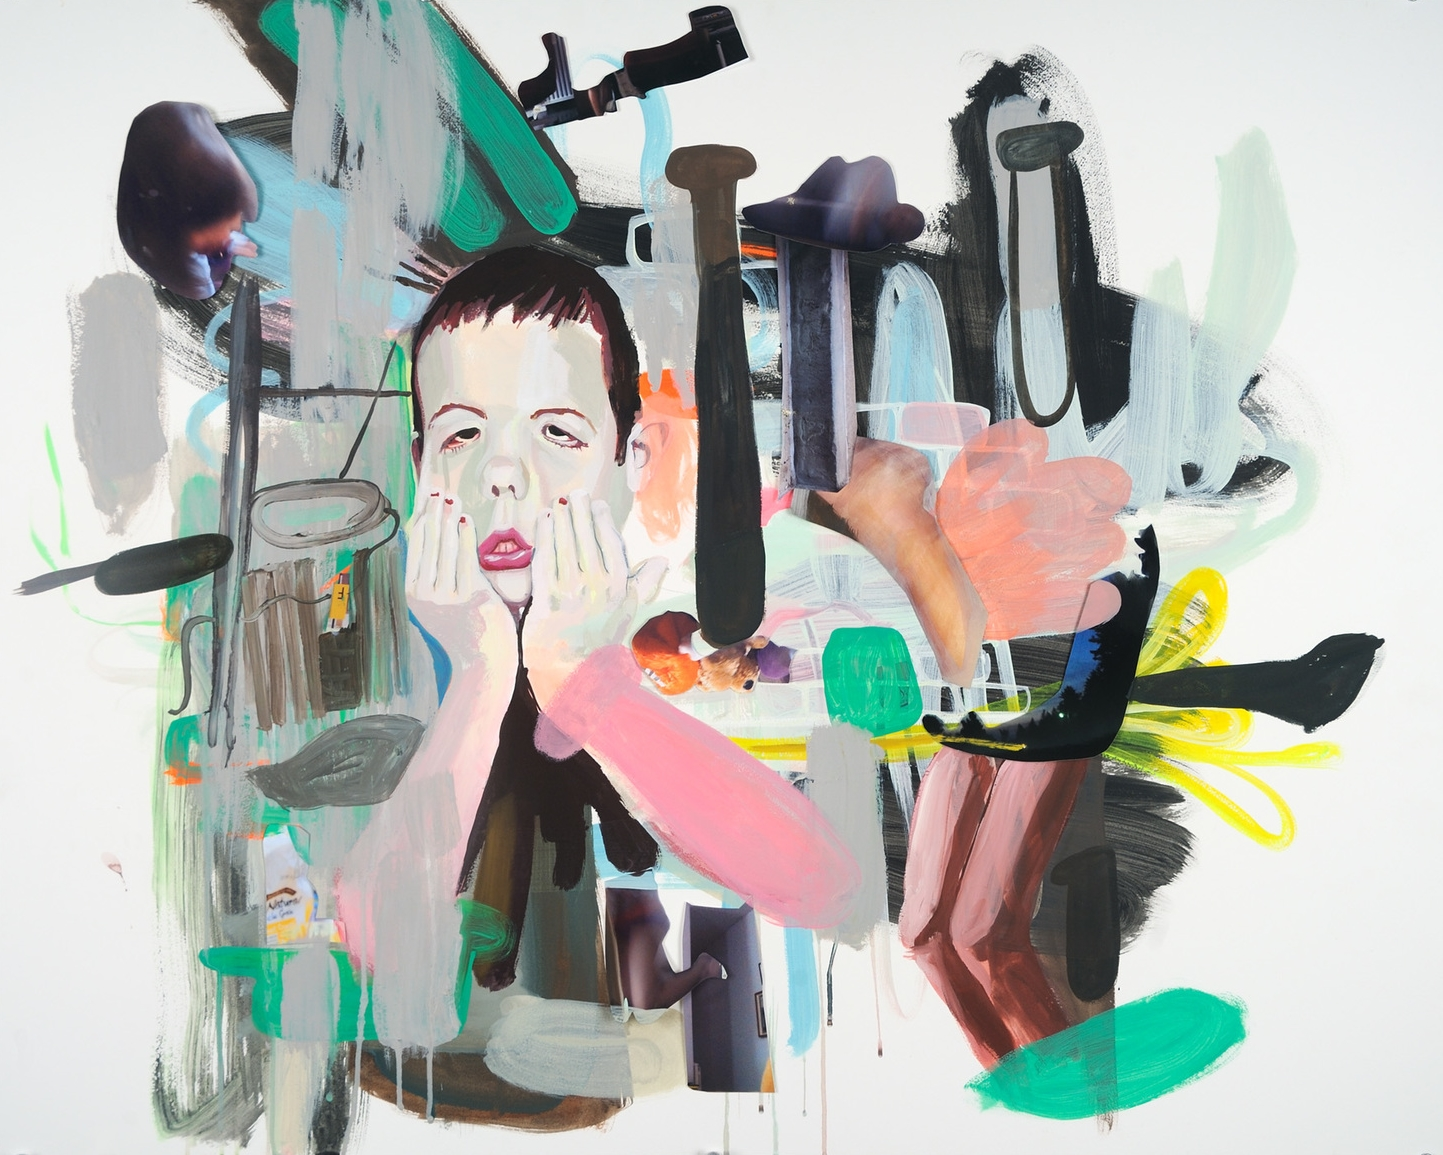 "Felix / Chaos Mixed media, gouache on paper board 40"" x 26"" 2012"